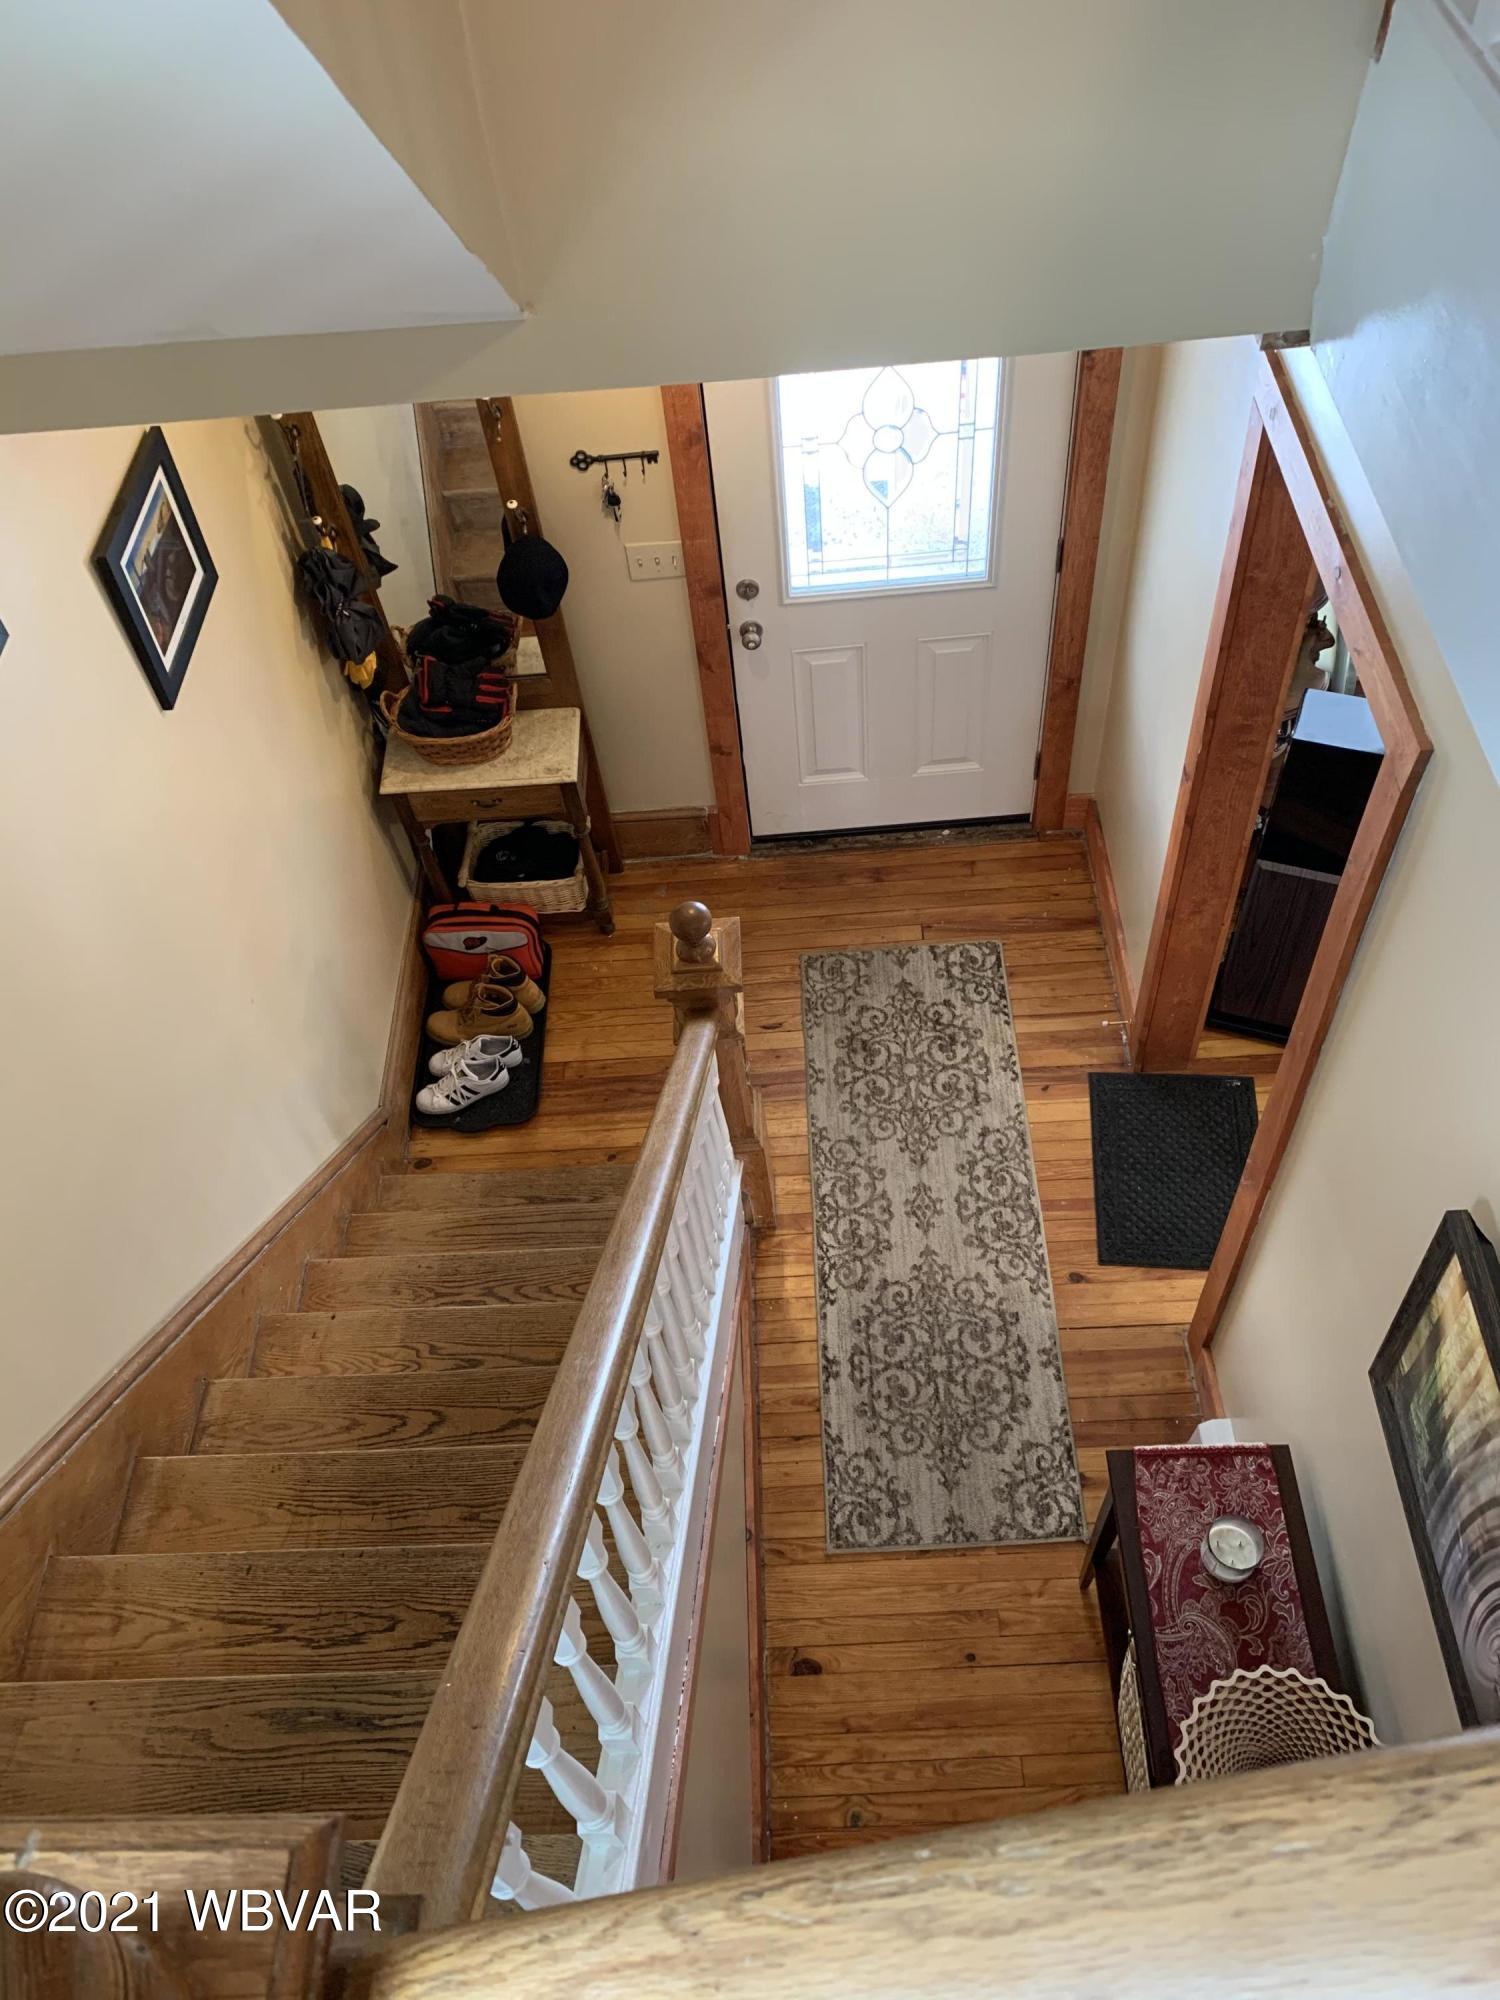 112 NEW STREET, Muncy, PA 17756, 3 Bedrooms Bedrooms, ,1.5 BathroomsBathrooms,Residential,For sale,NEW,WB-91923